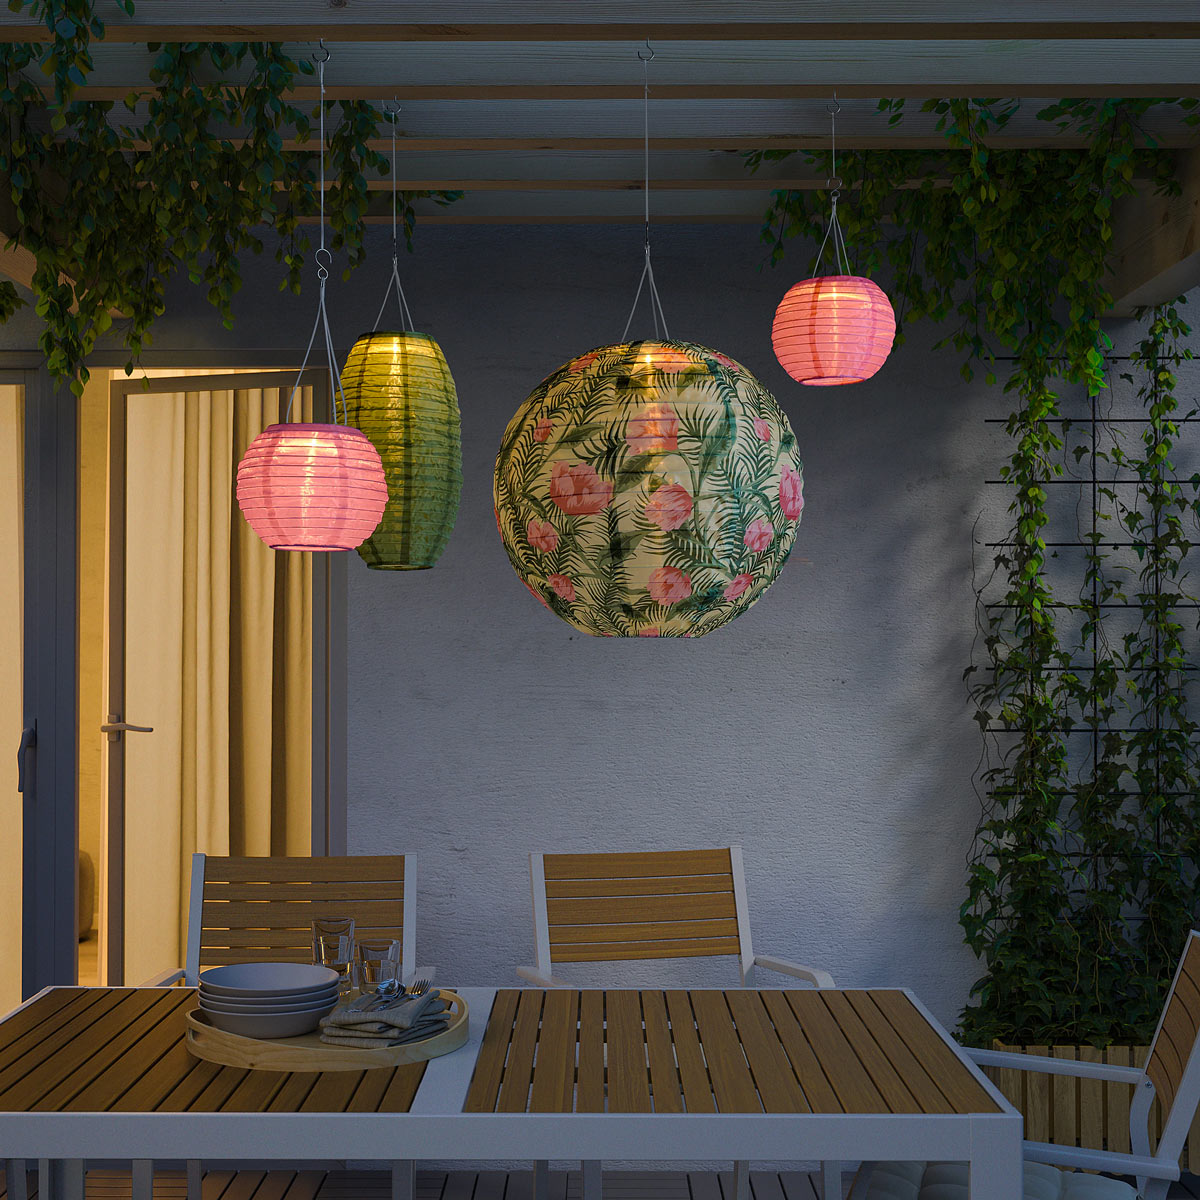 Offerte IKEA family giugno 2020, lanterne SOLVINDEN.